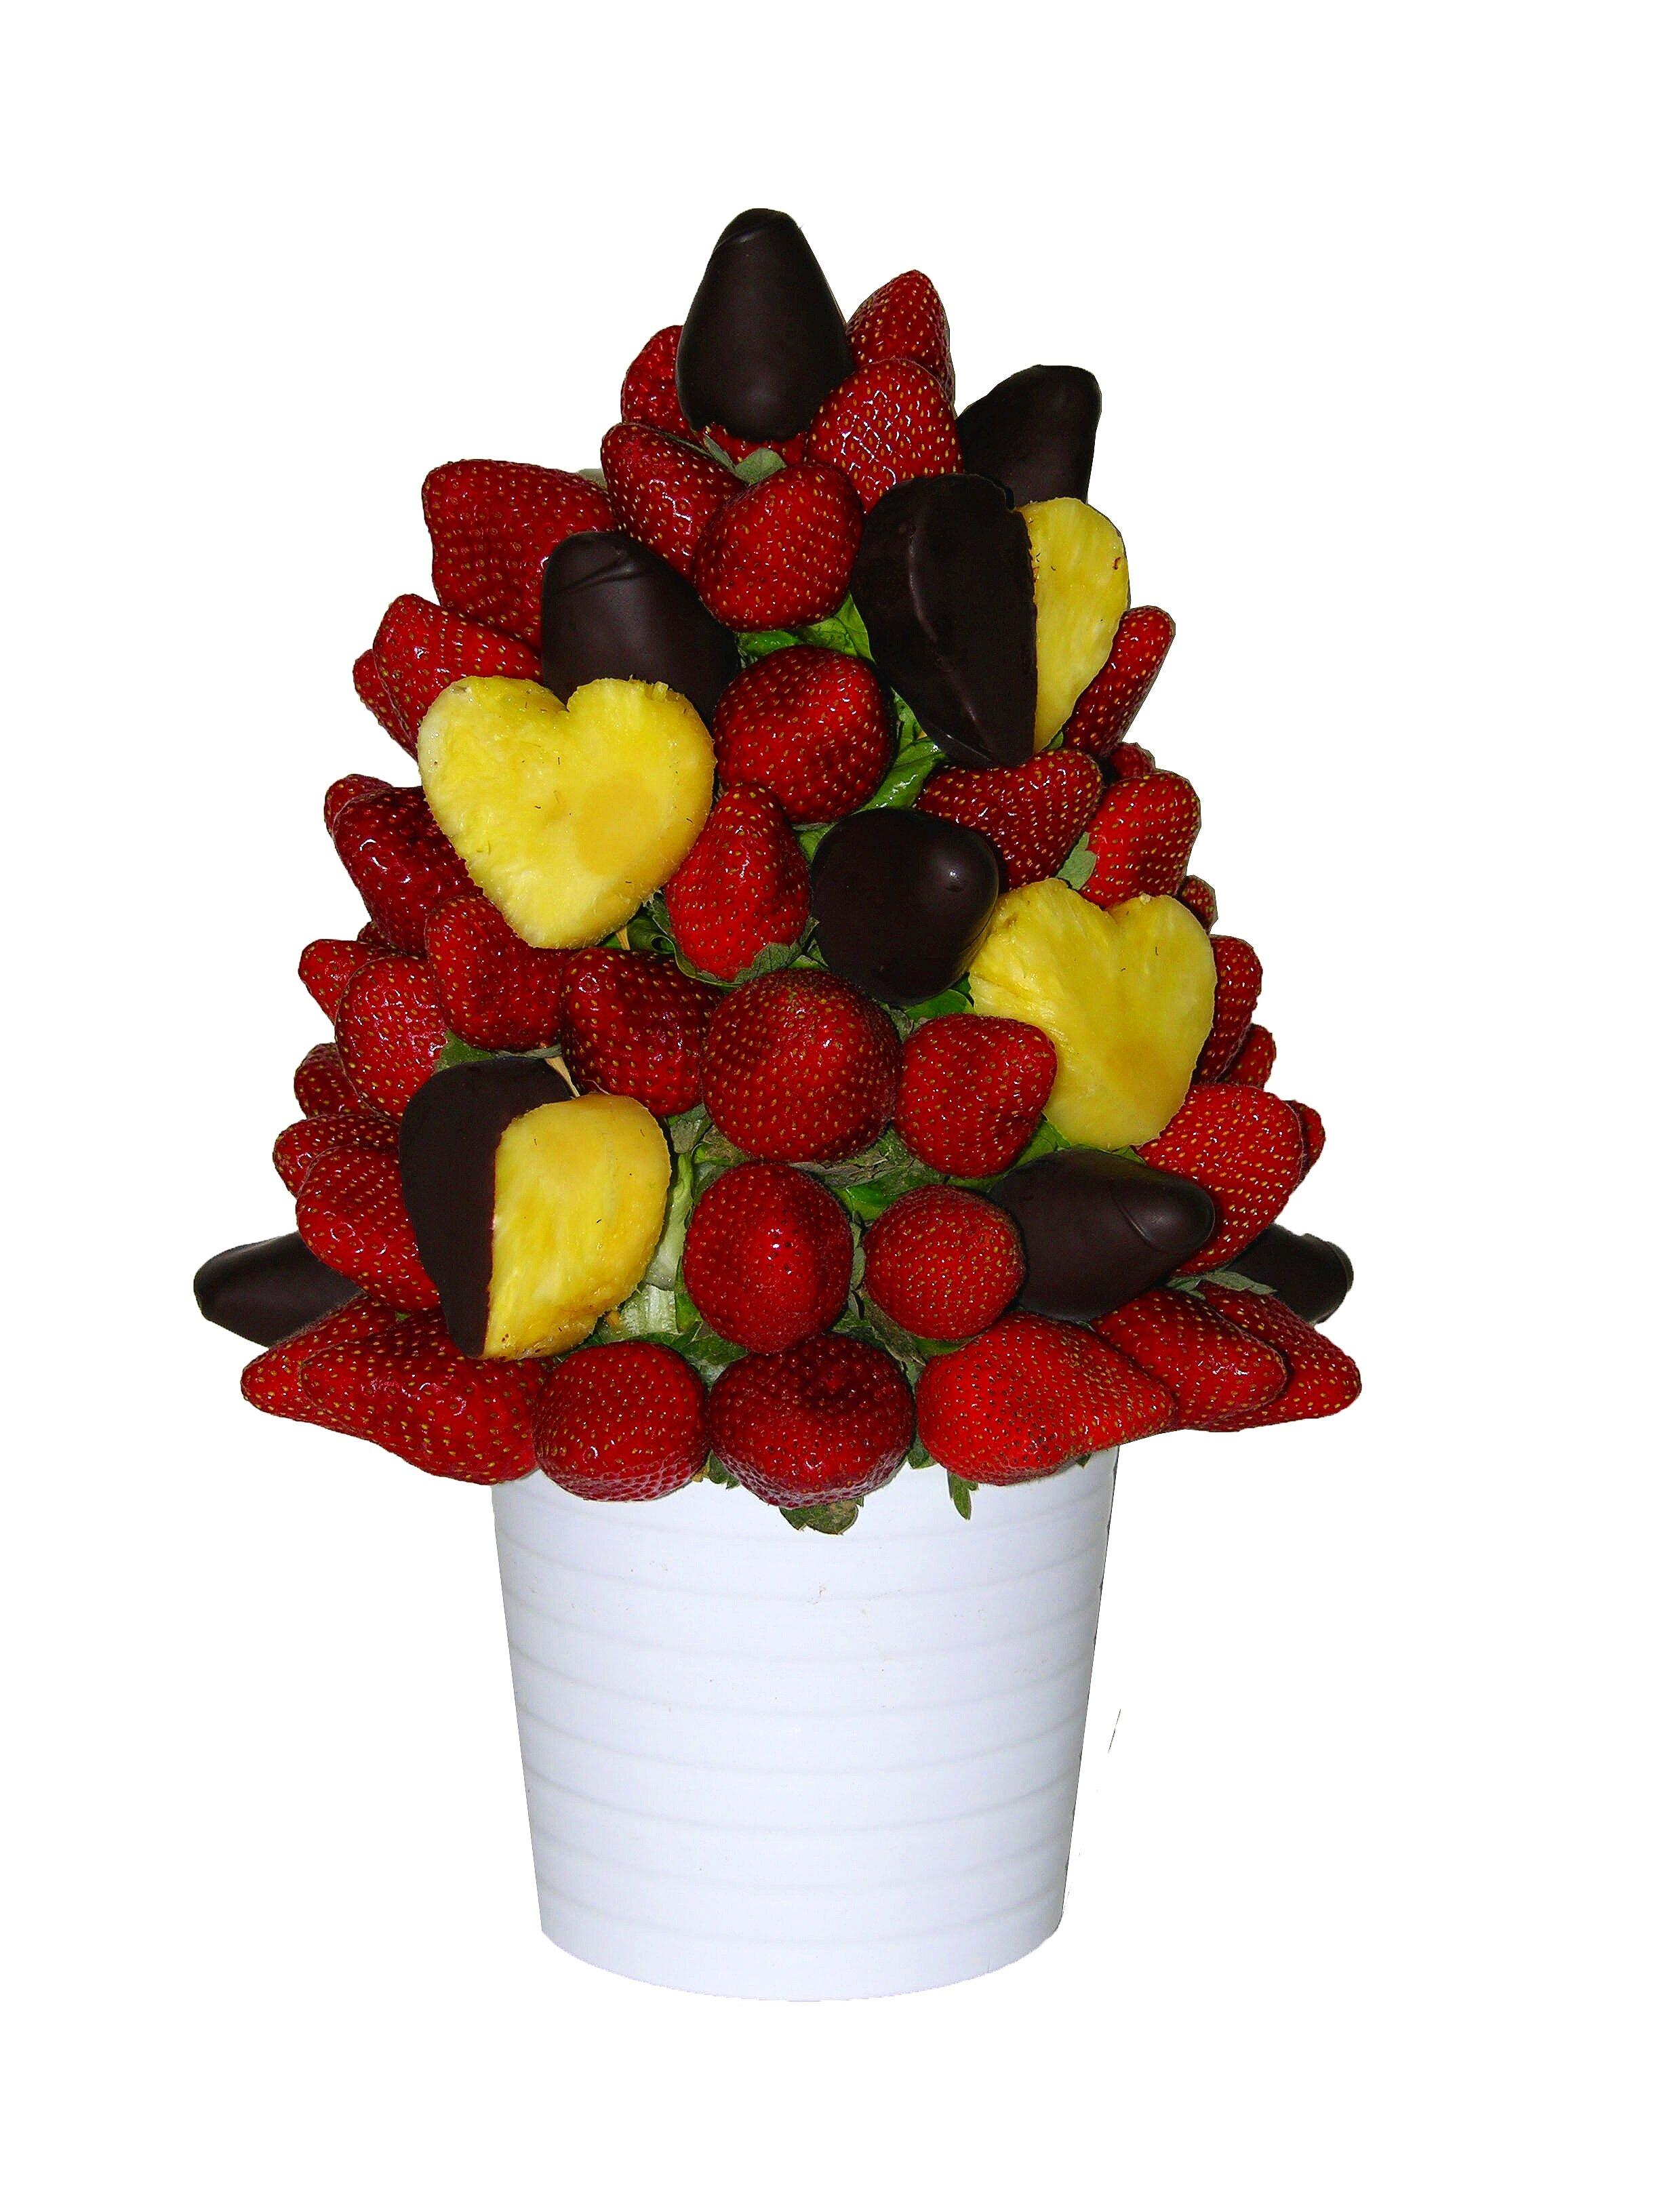 Chocolate Strawberries Valentines Gift Edible Arrangements Uk Edible Gift Fruit Bouquet Edible Arrangements Fruit Bouquets Gifts Selections Uk Delivery